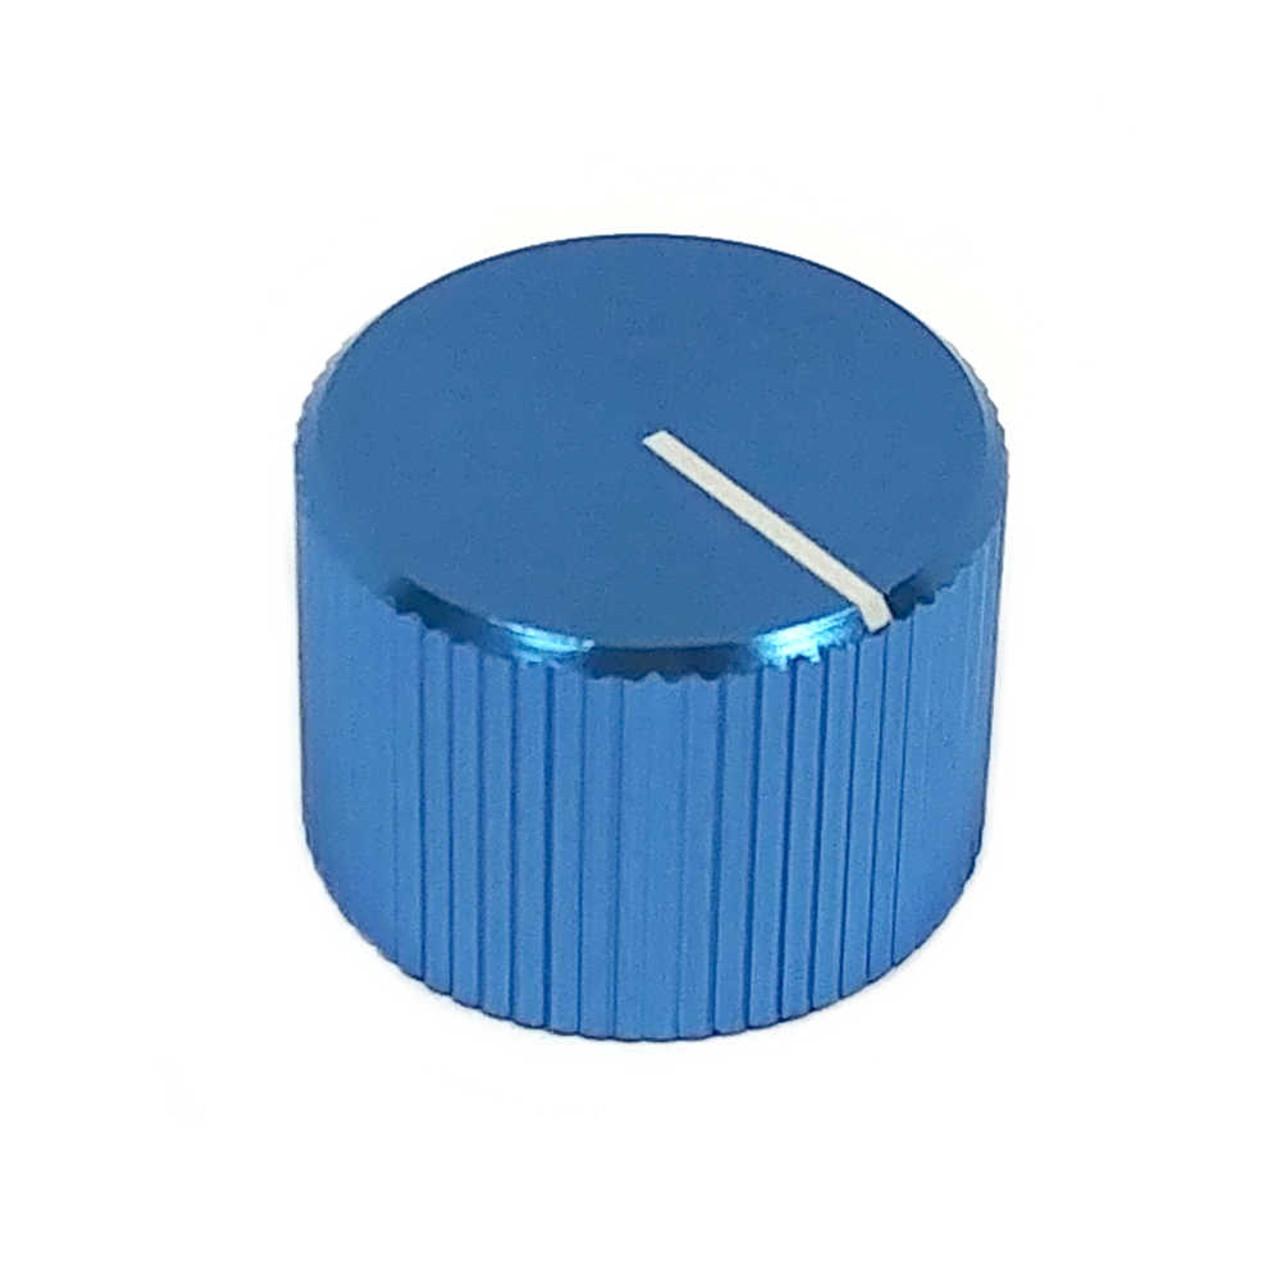 Anodized Aluminum Knob - Blue